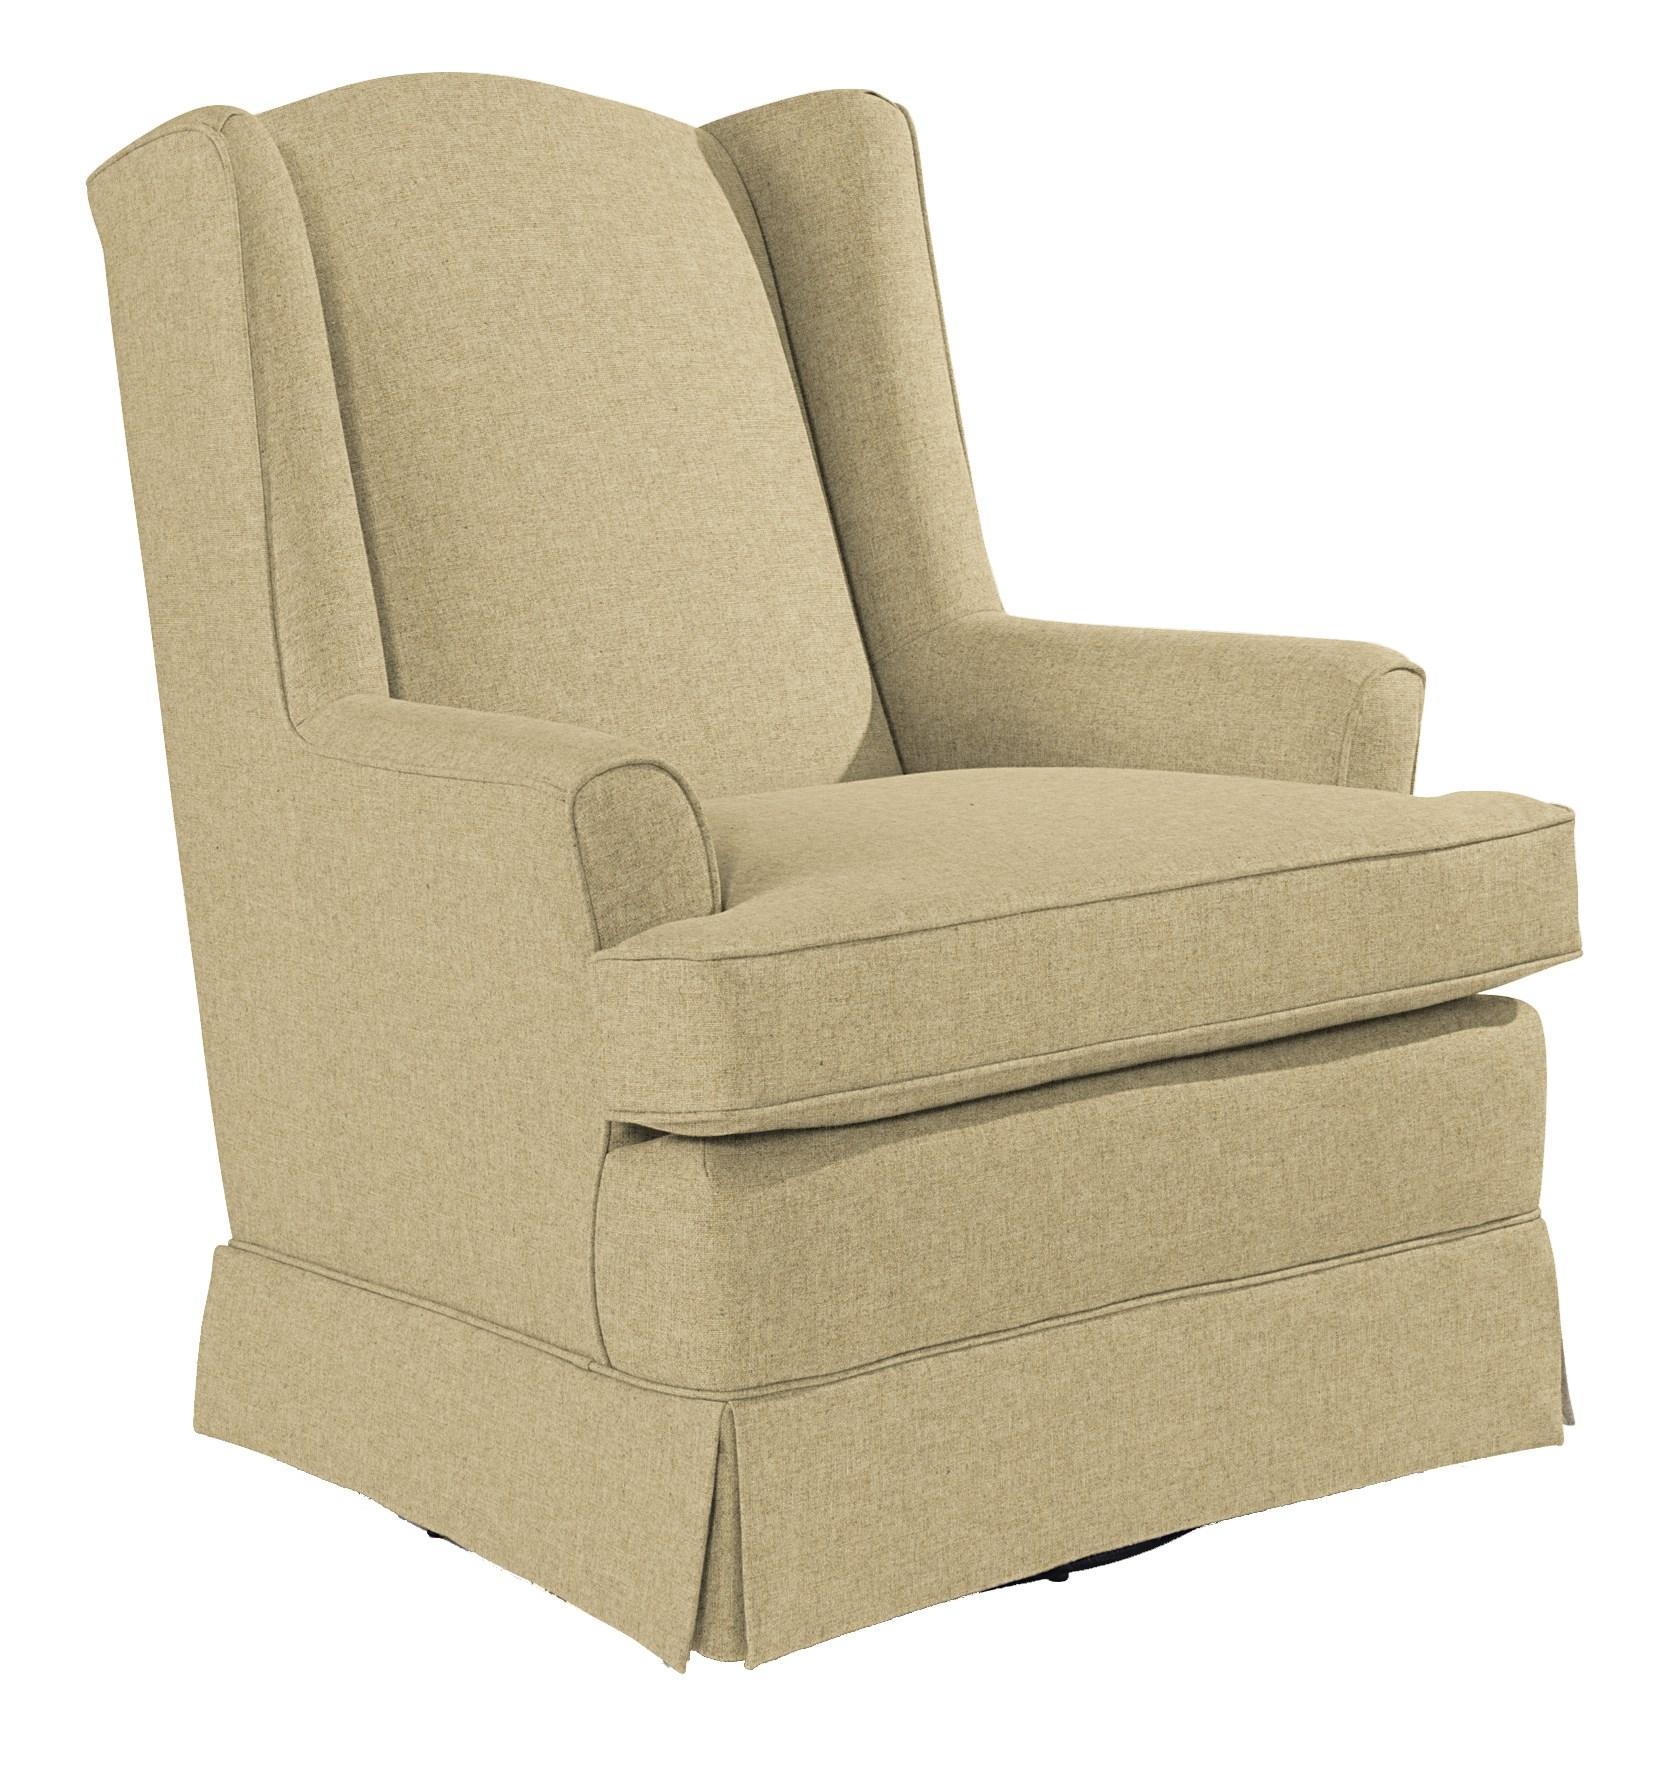 Best Home Furnishings Chairs   Swivel Glide Natasha Swivel Glider With Wing  Back And Skirt